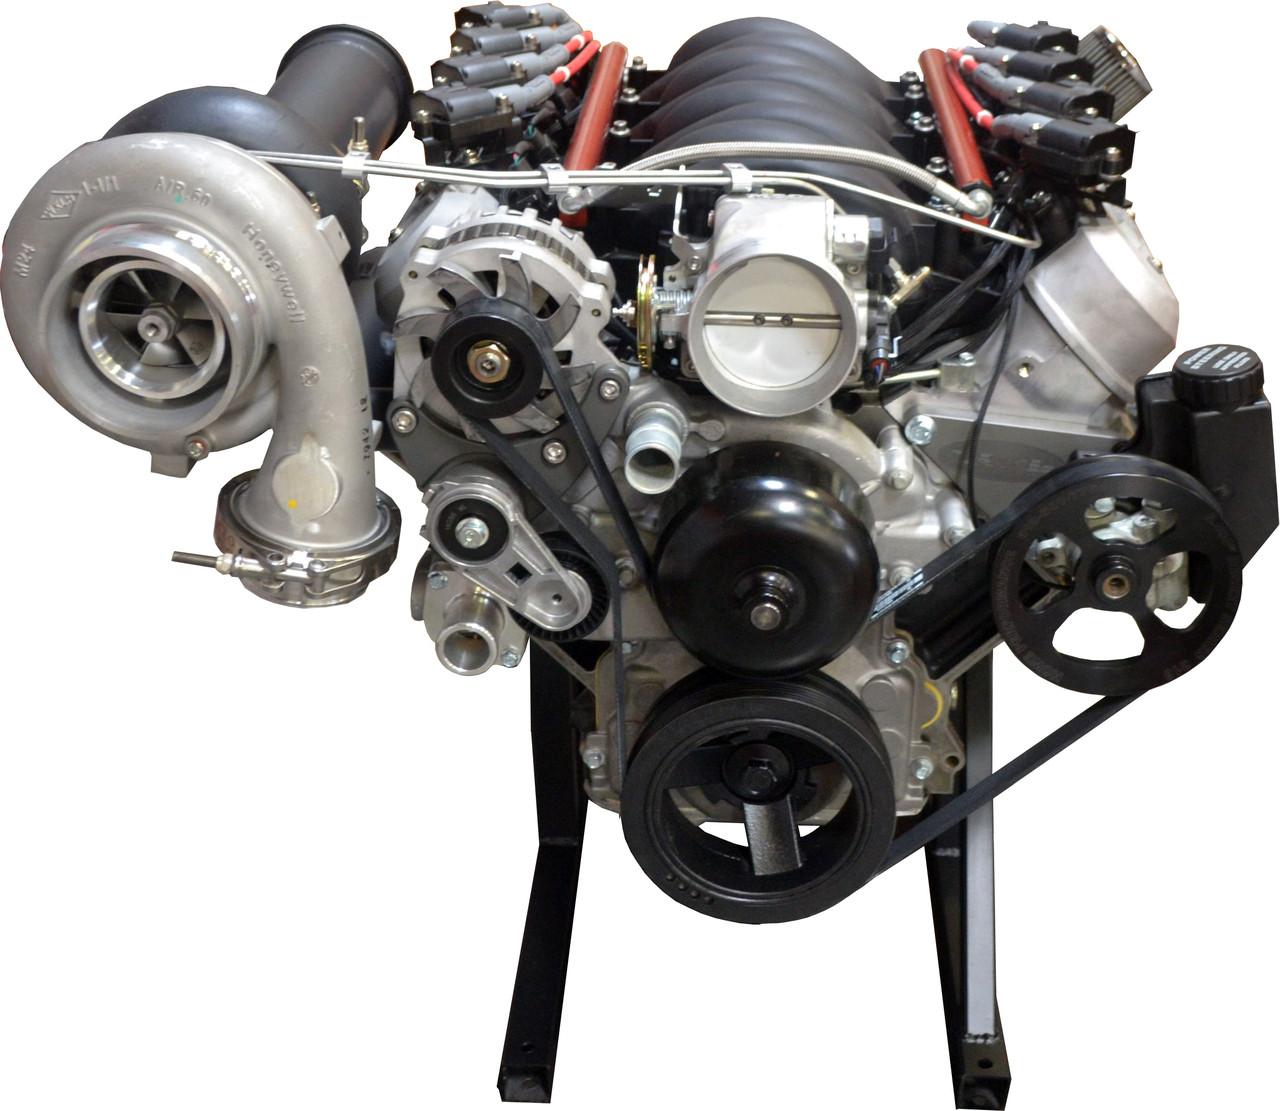 Turn Key Engine LSX 448 C I Turbo 950 HP Engine Assembly - Street